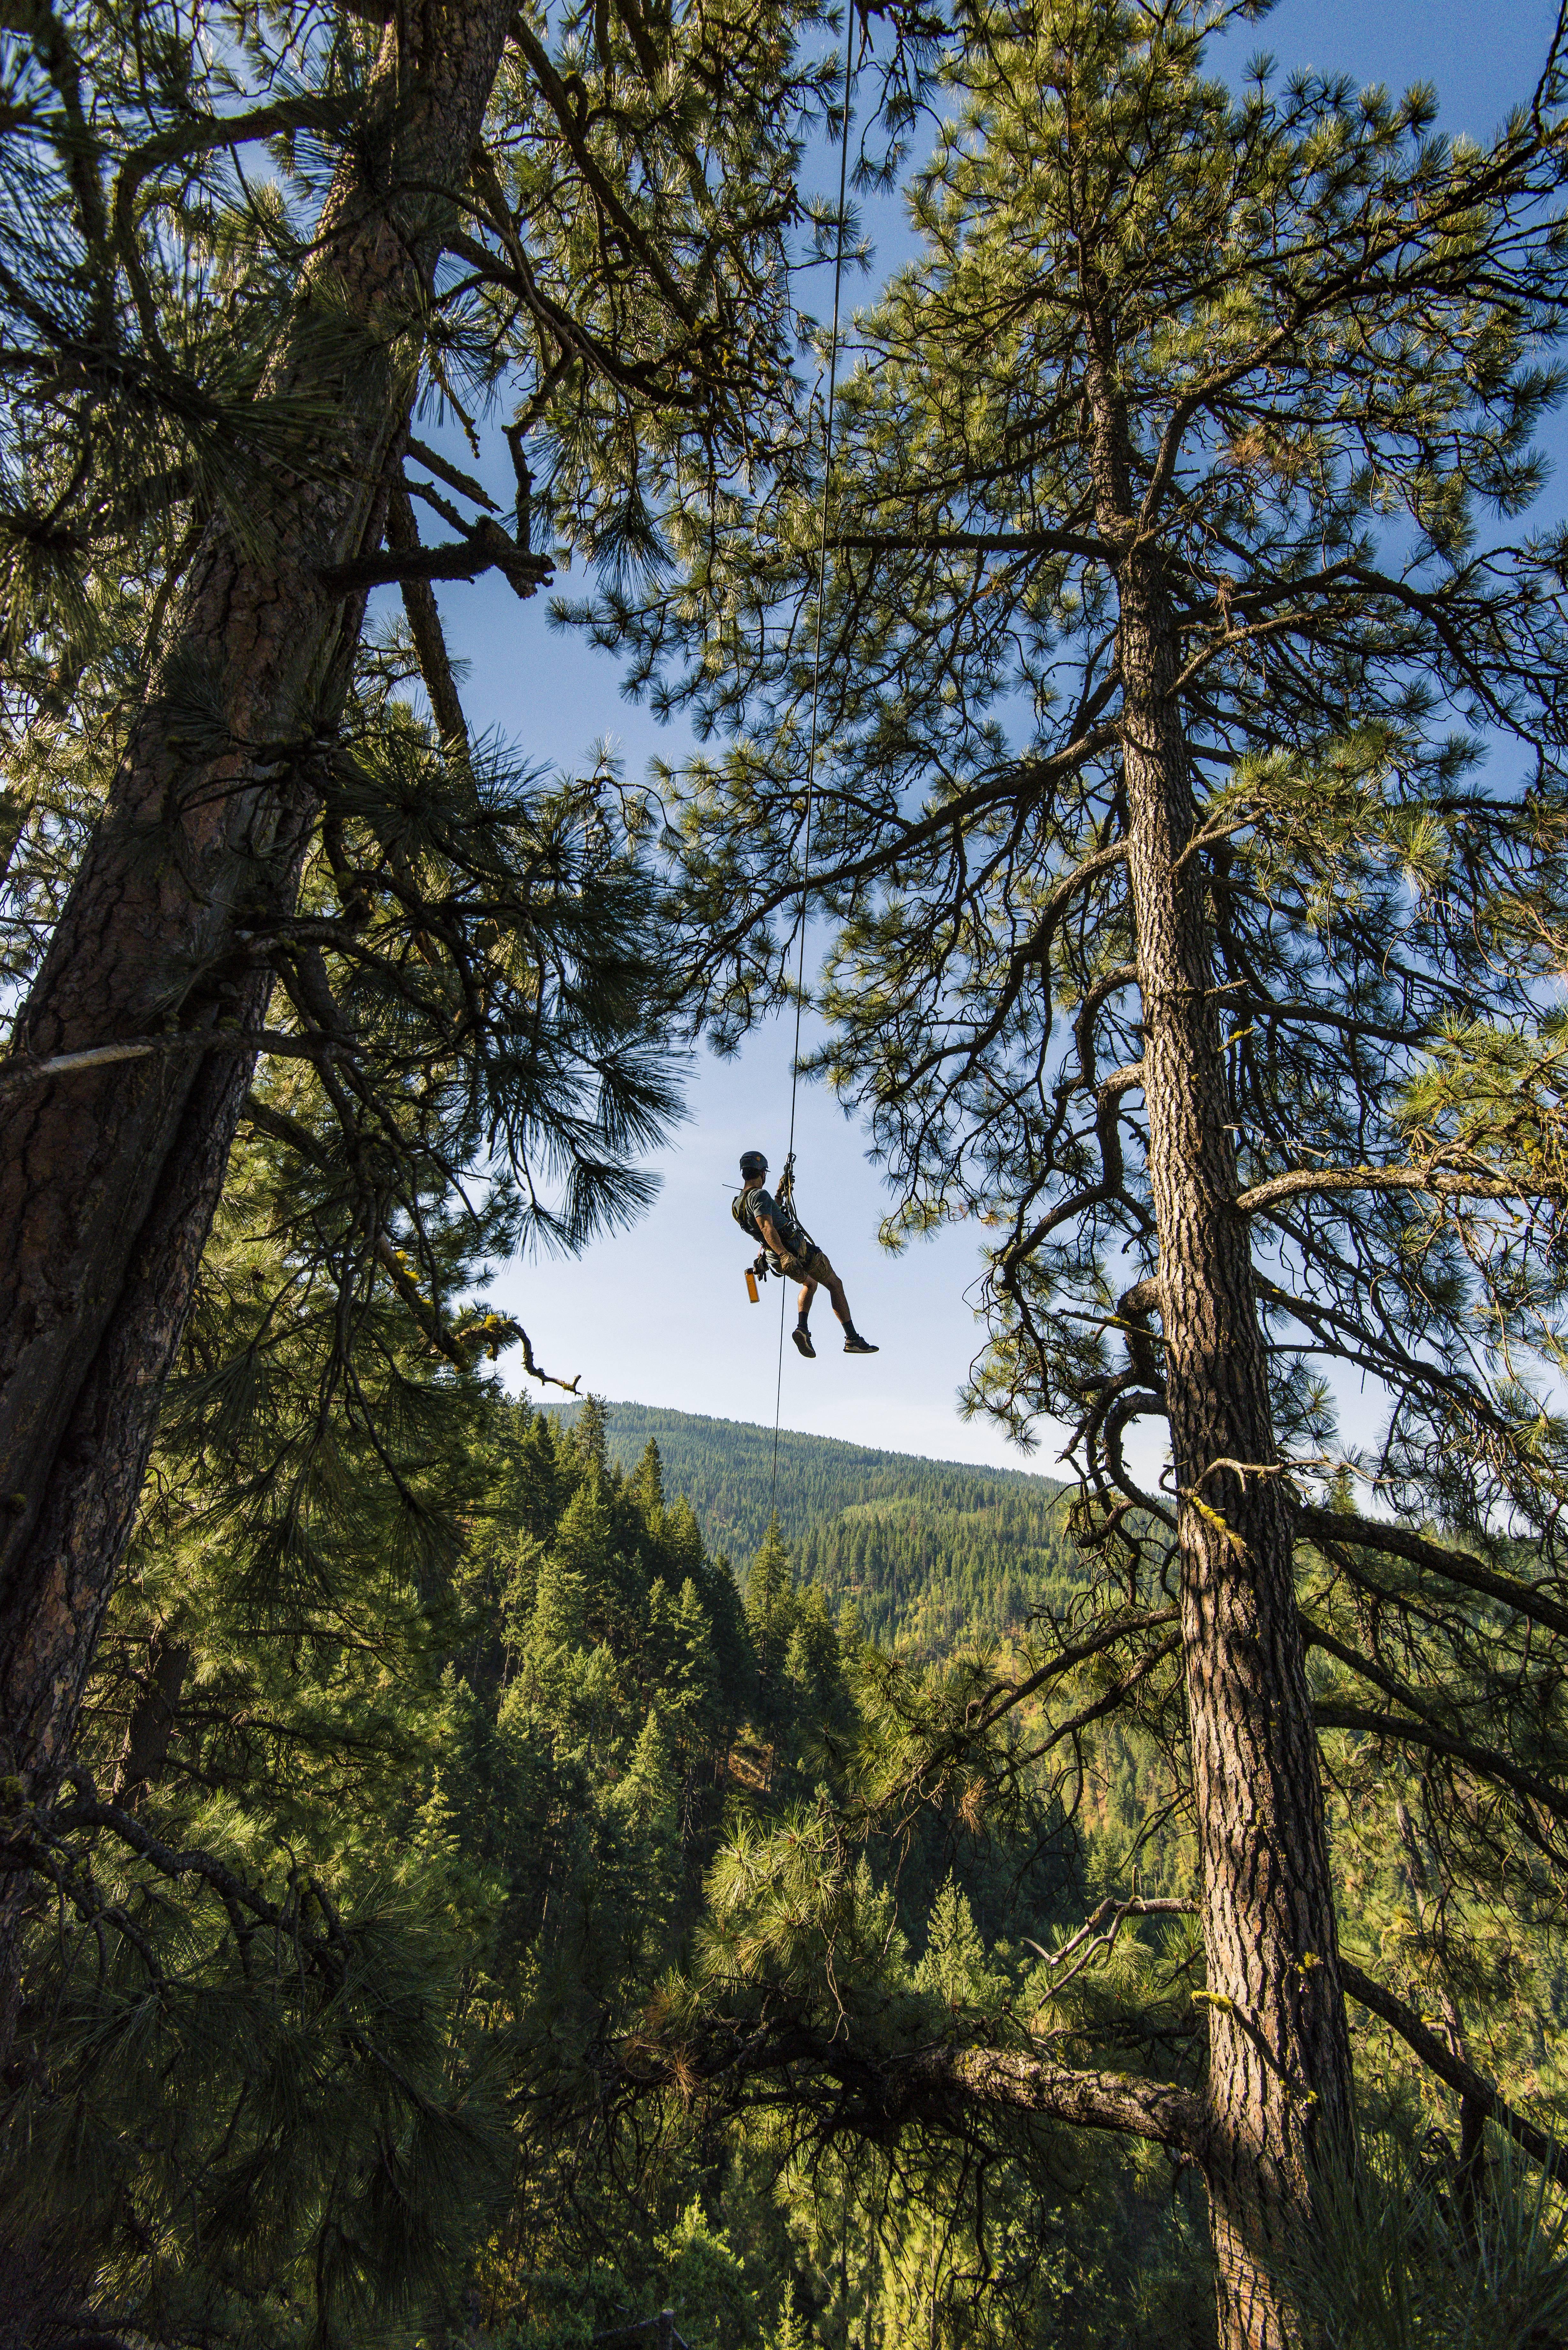 Timberline Adventures Zip Line Tours, Coeur d'Alene. Photo Credit: Idaho Tourism.